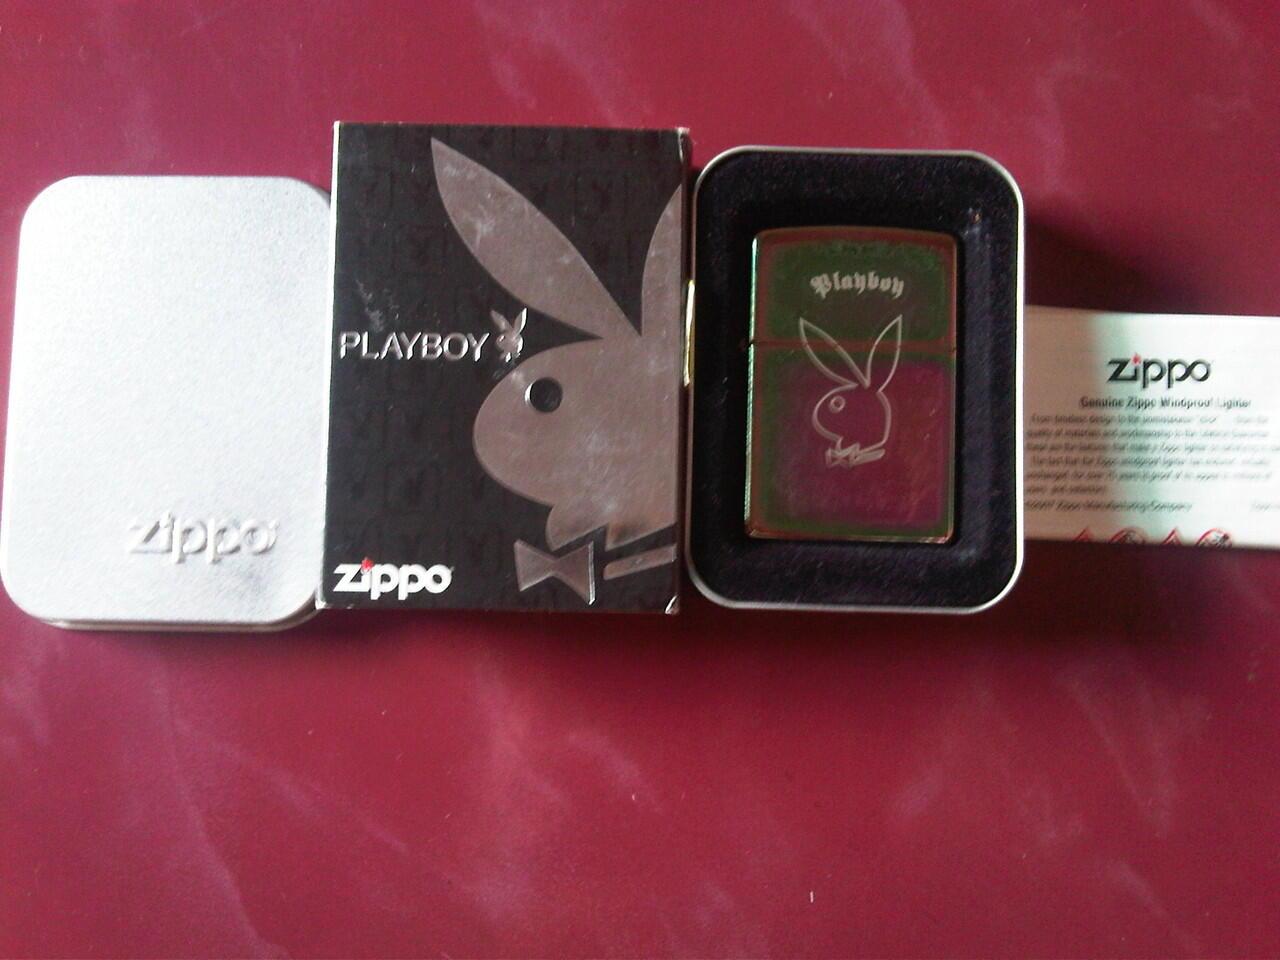 zippo playboy 24447 Spectrum Finish